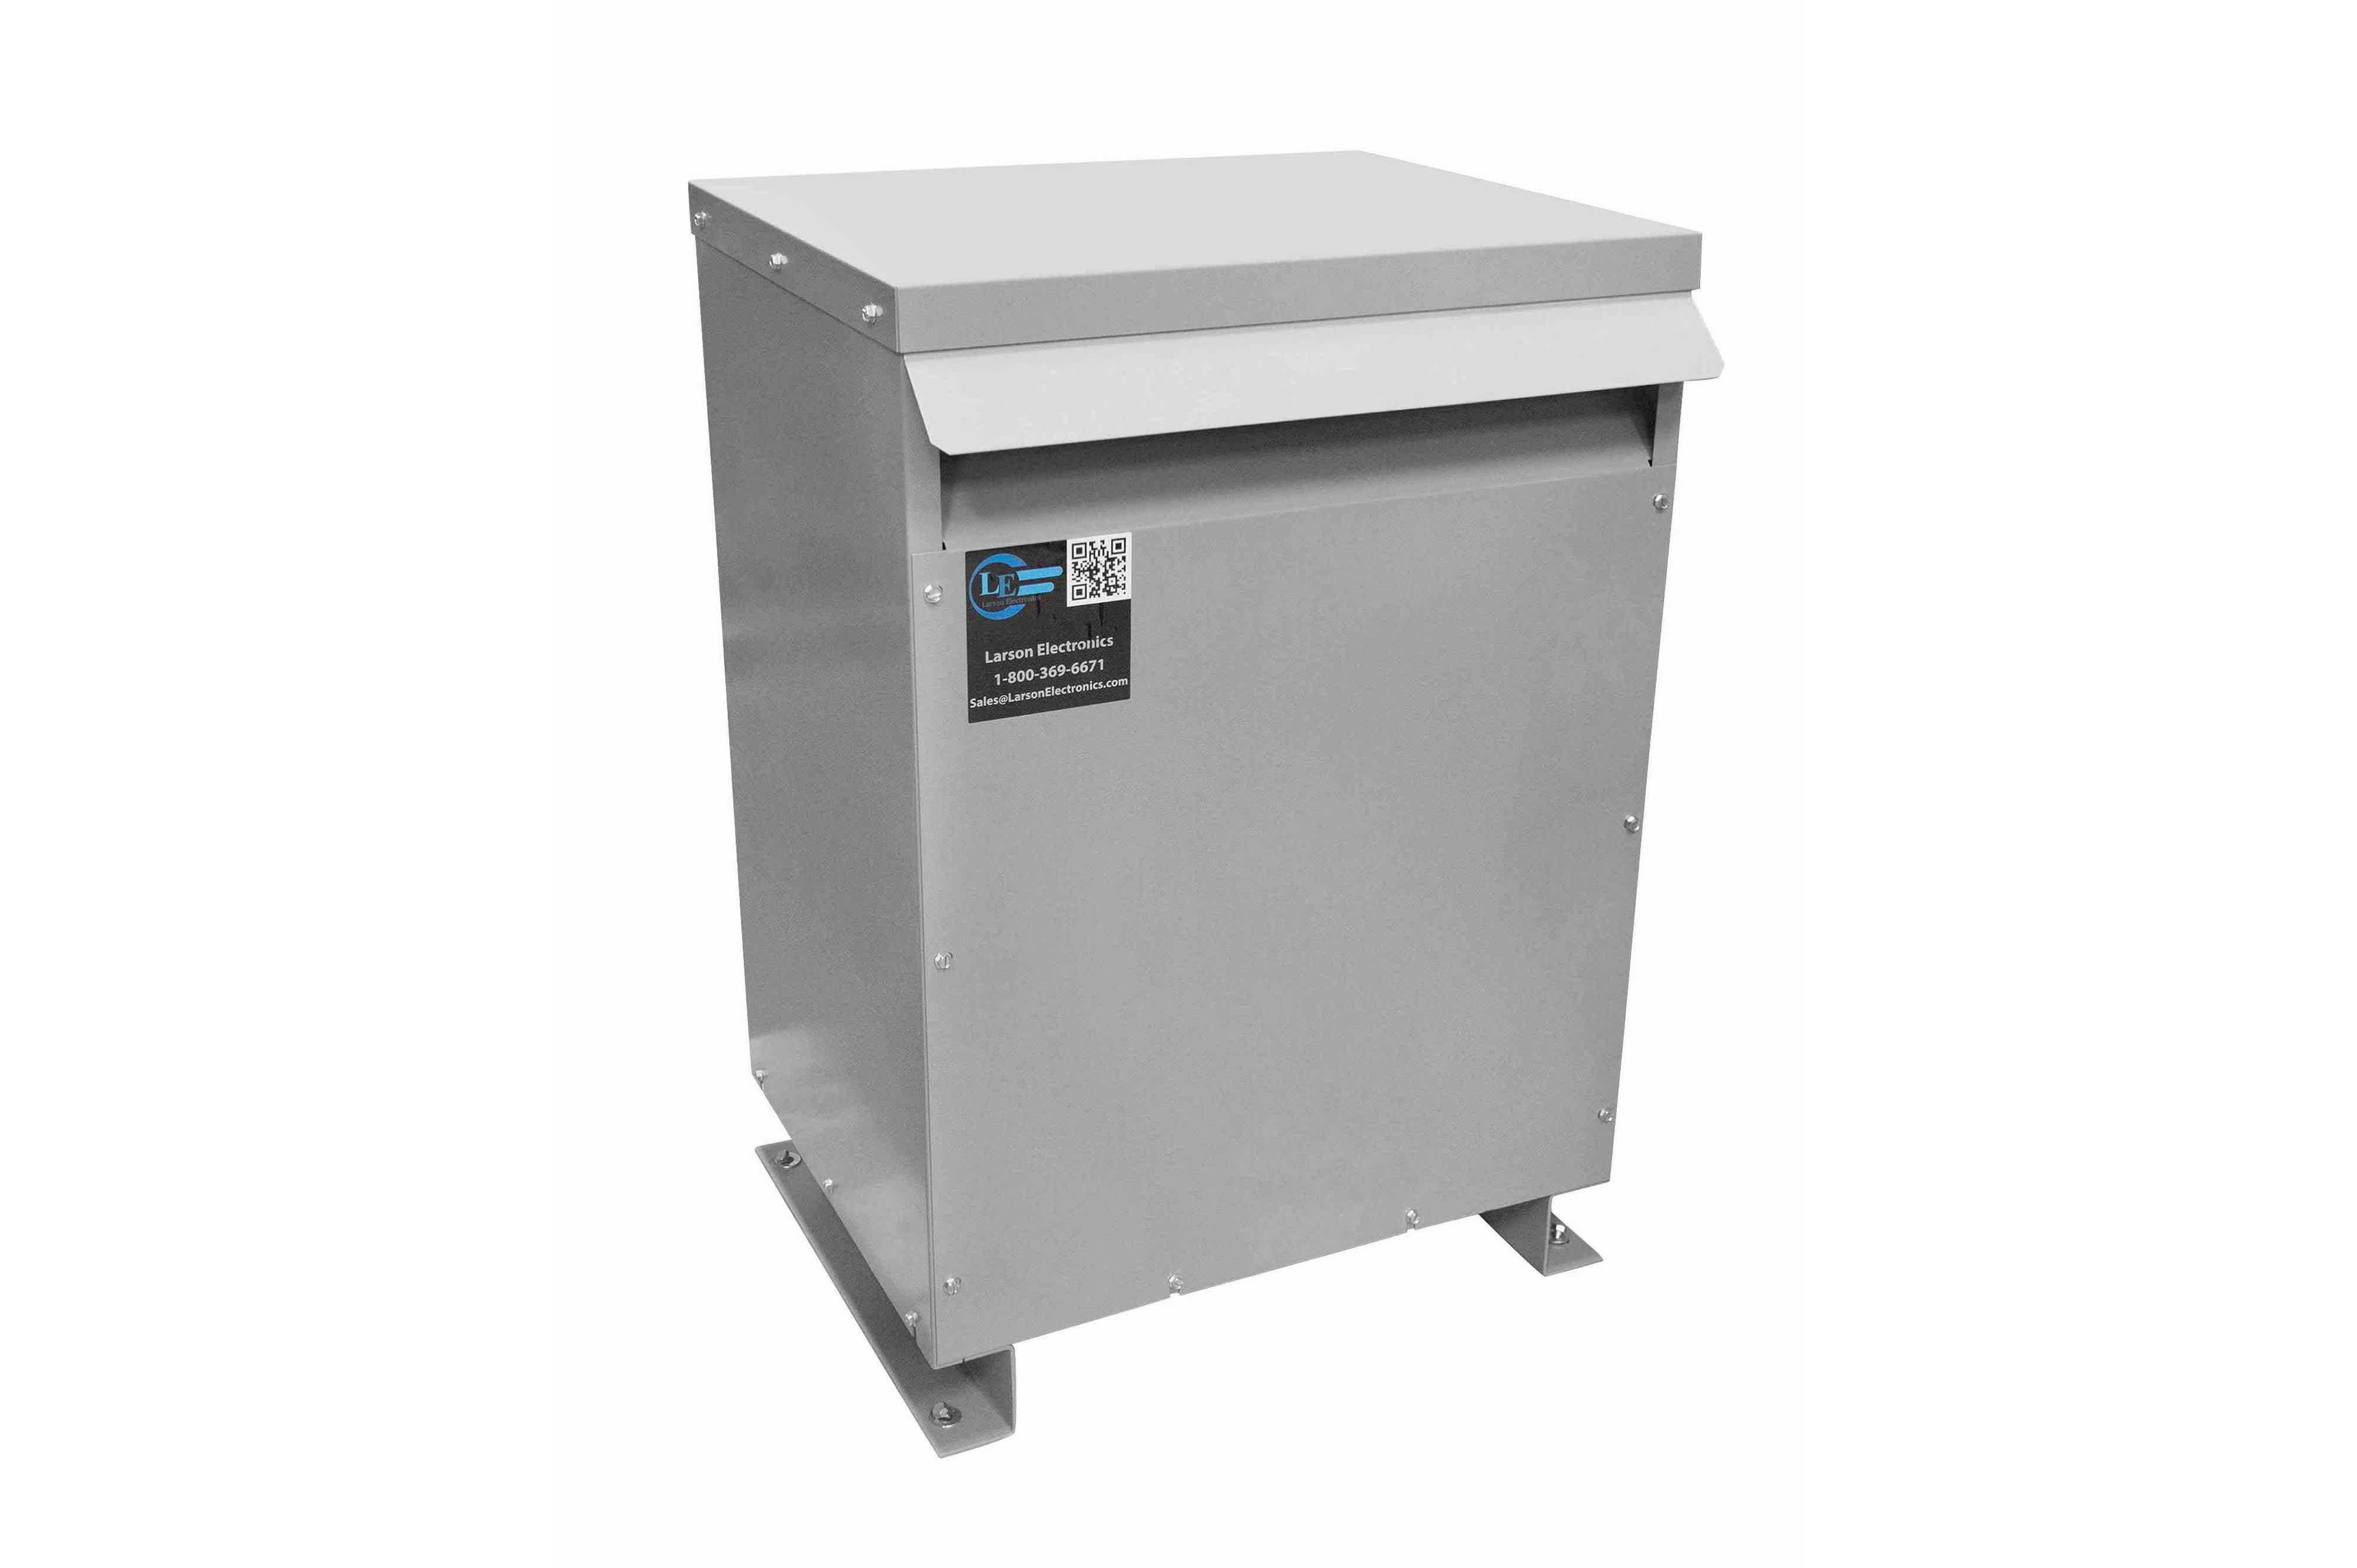 237.5 kVA 3PH Isolation Transformer, 380V Wye Primary, 480V Delta Secondary, N3R, Ventilated, 60 Hz